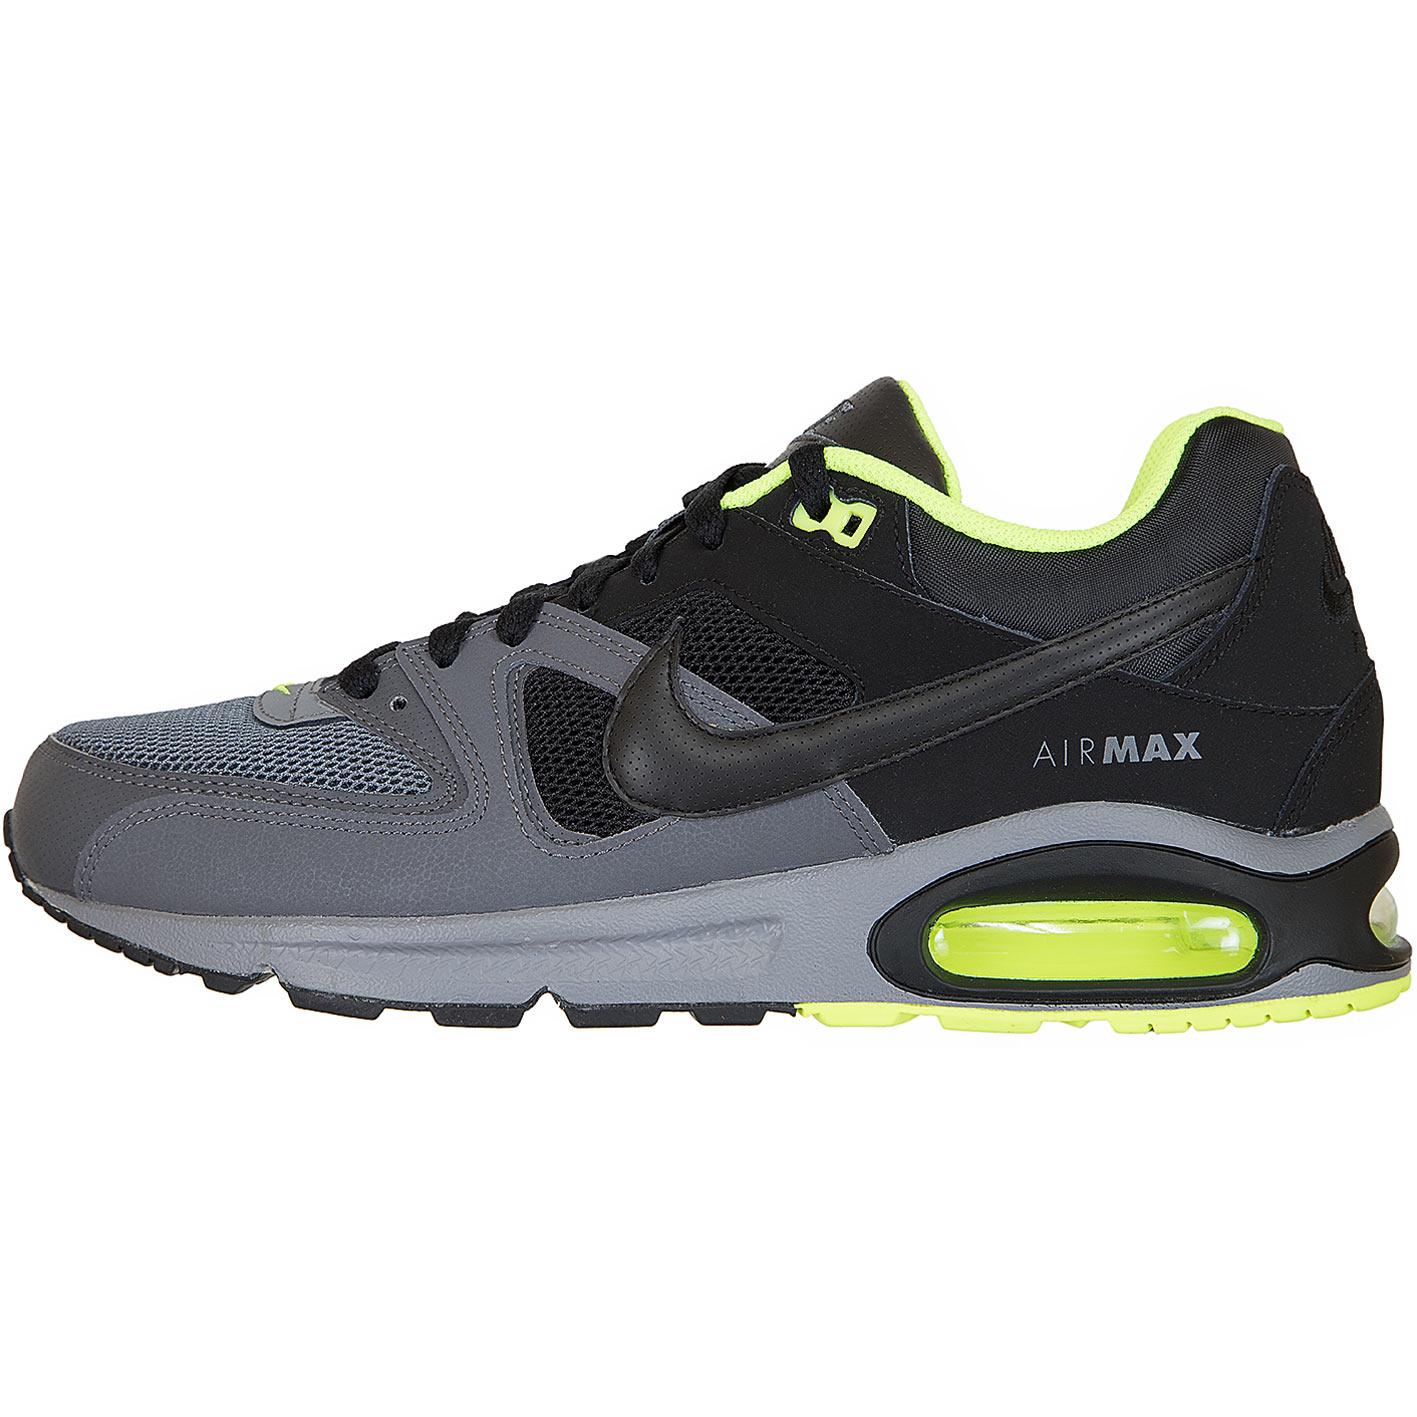 Nike Herren GRAU SCHWARZ NEONGELB Sneaker AIR MAX COMMAND